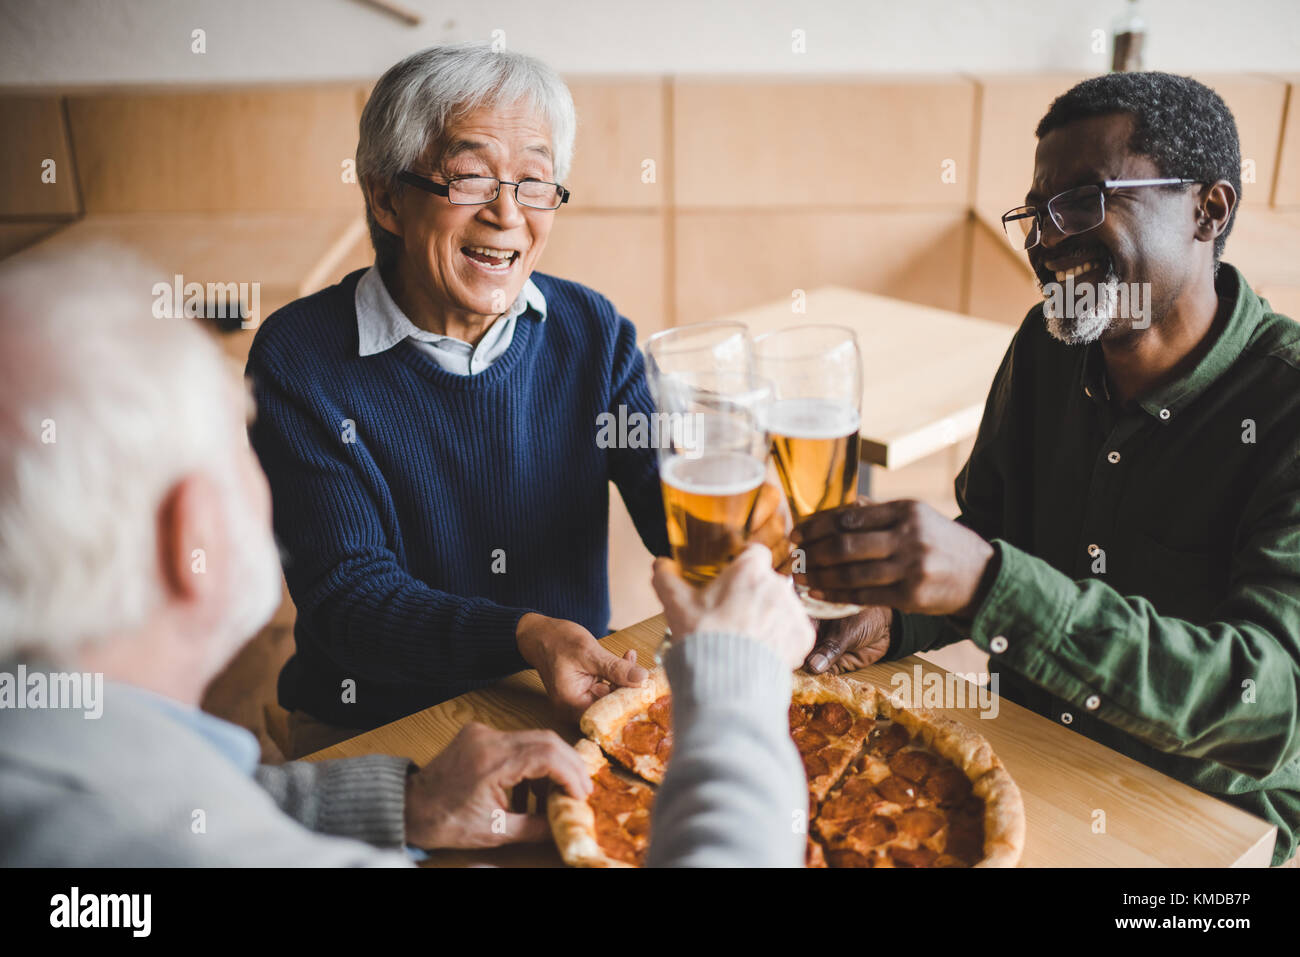 Amigos senior tintineo o vasos de cerveza Imagen De Stock